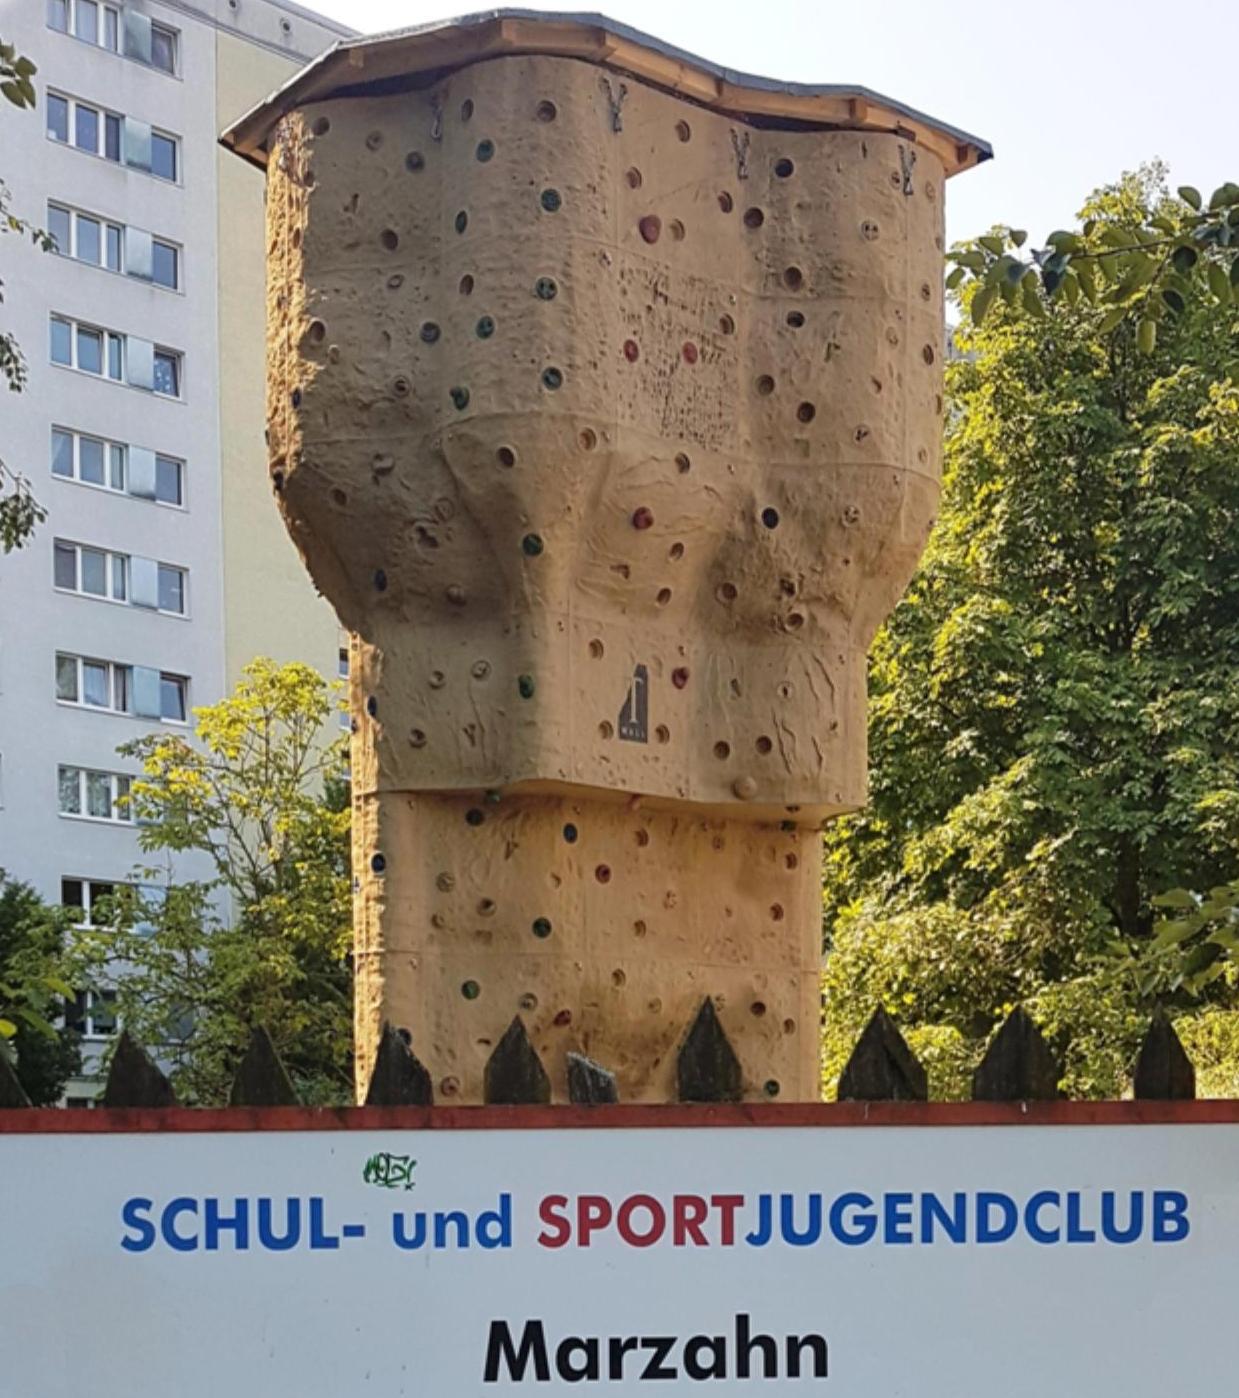 "Tipp 2: Fr, 13.9., 16 Uhr: ""25 Jahre Sporti"". Klettern, Graffiti, Grillstation, Cocktailbar, Fußball-Billard, Kinderschminken uvm. | © GSJ gGmbH"